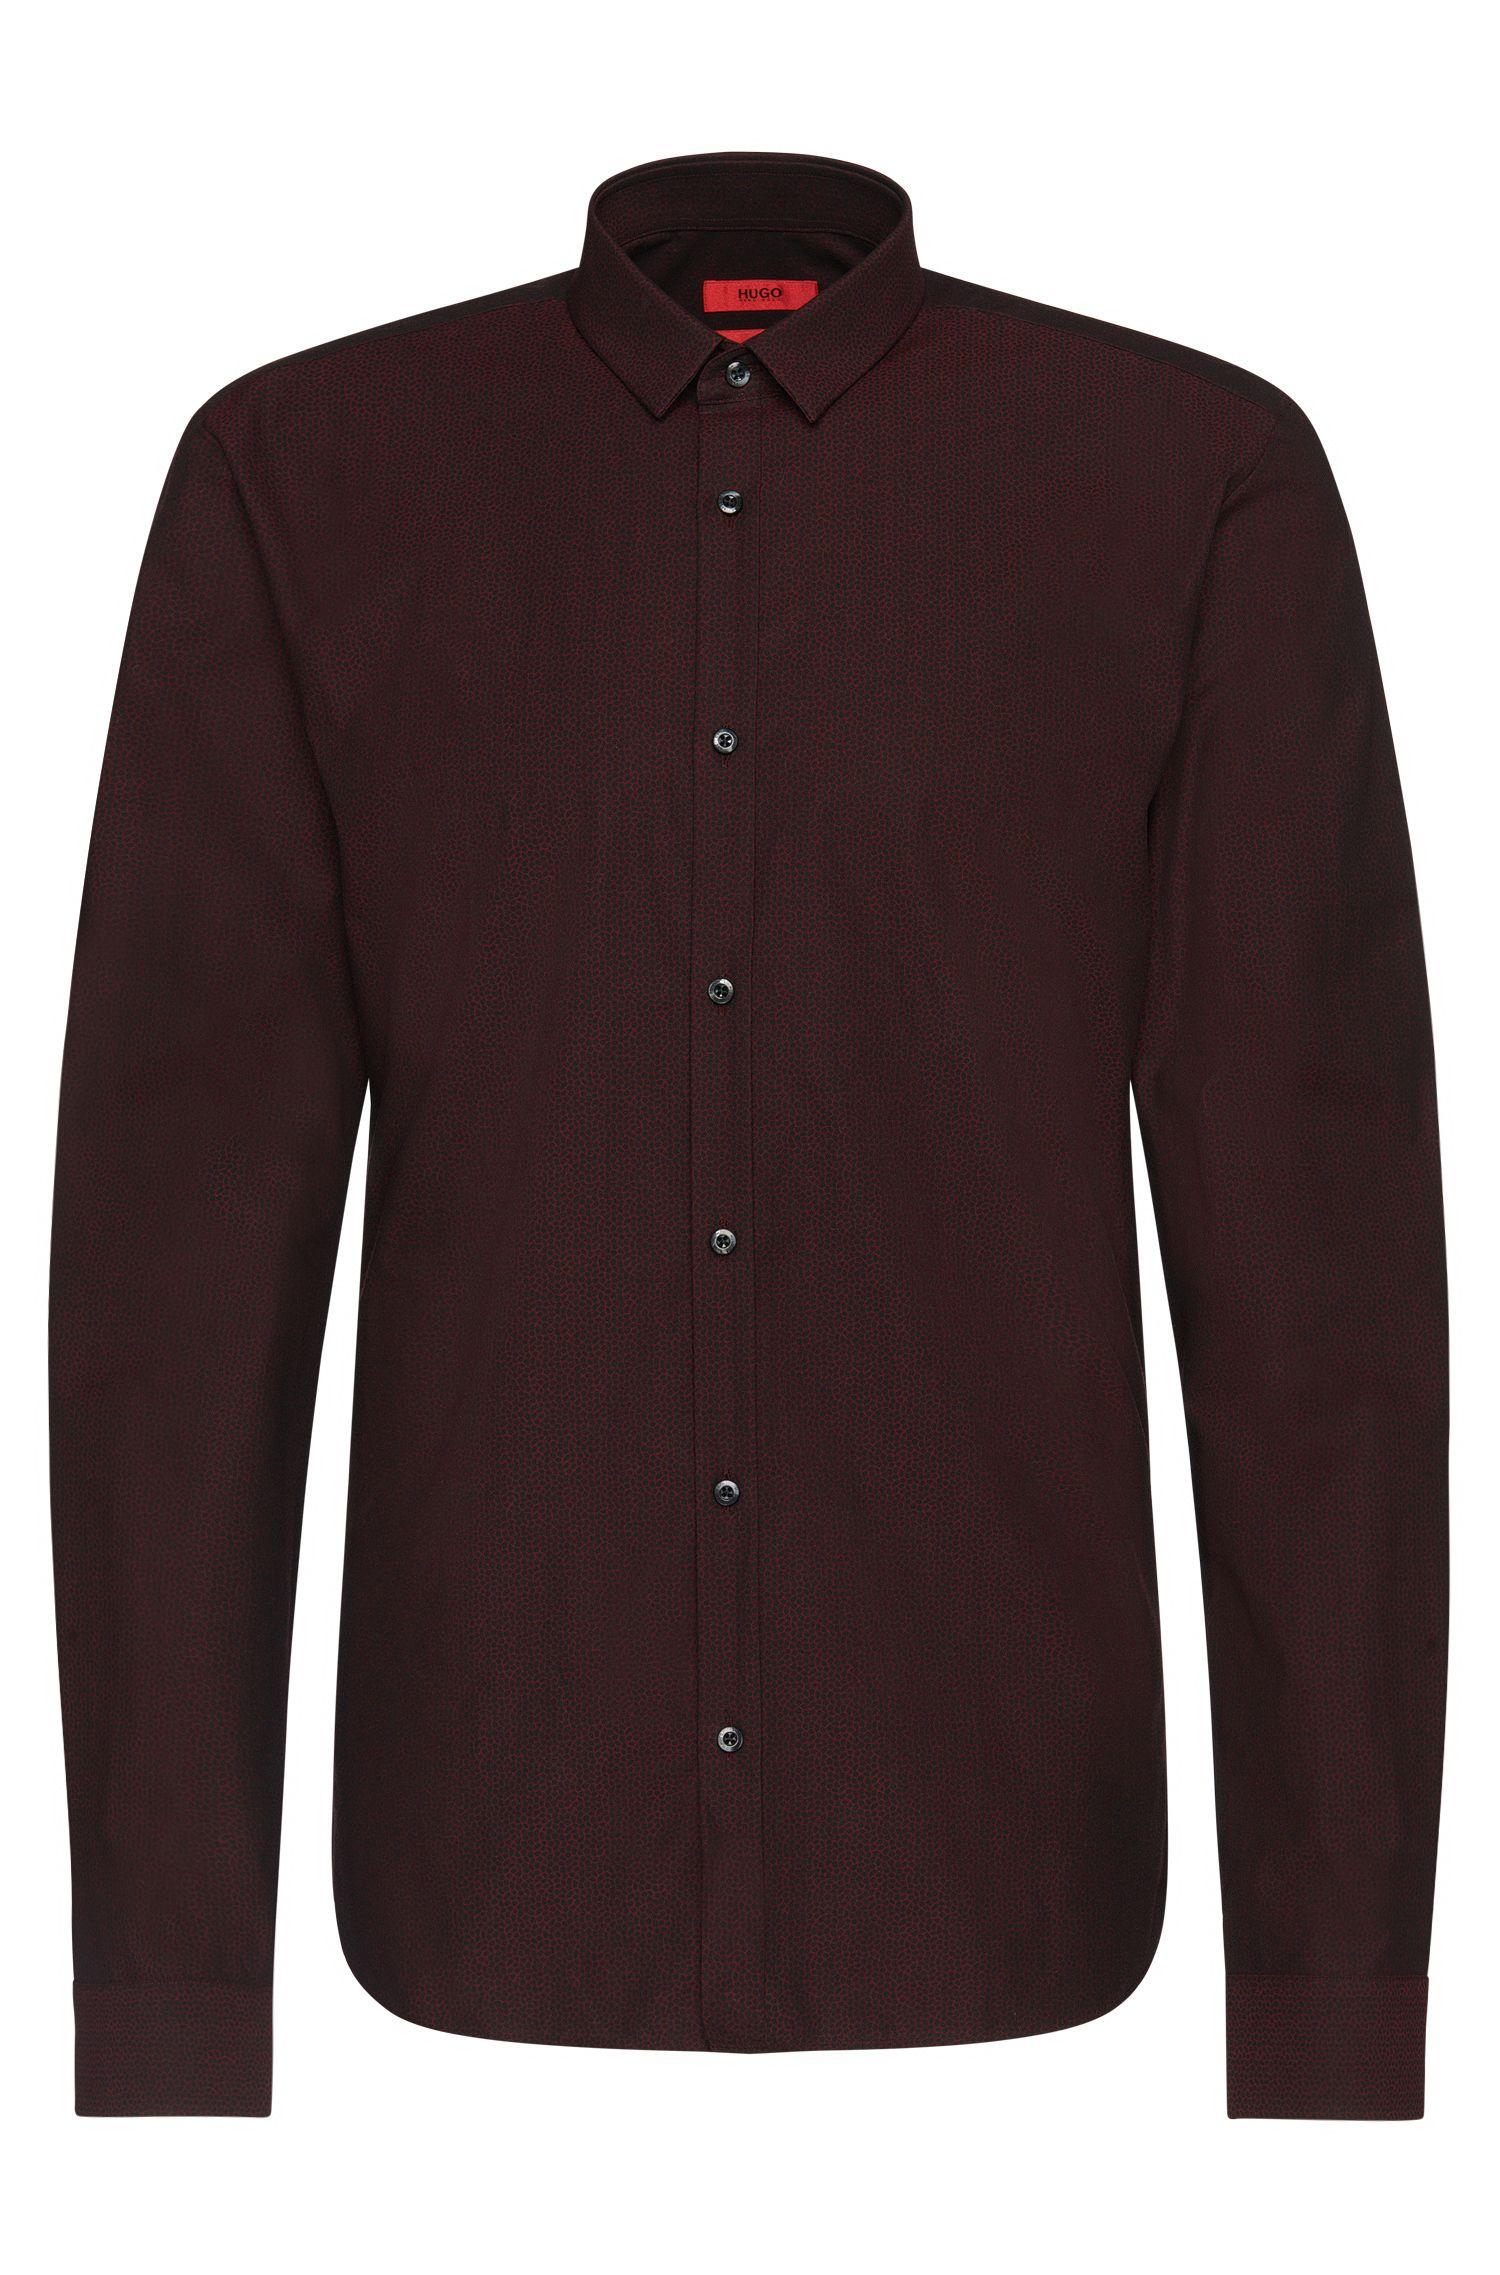 Fein gemustertes Slim-Fit Hemd aus Baumwolle: 'Ero3'